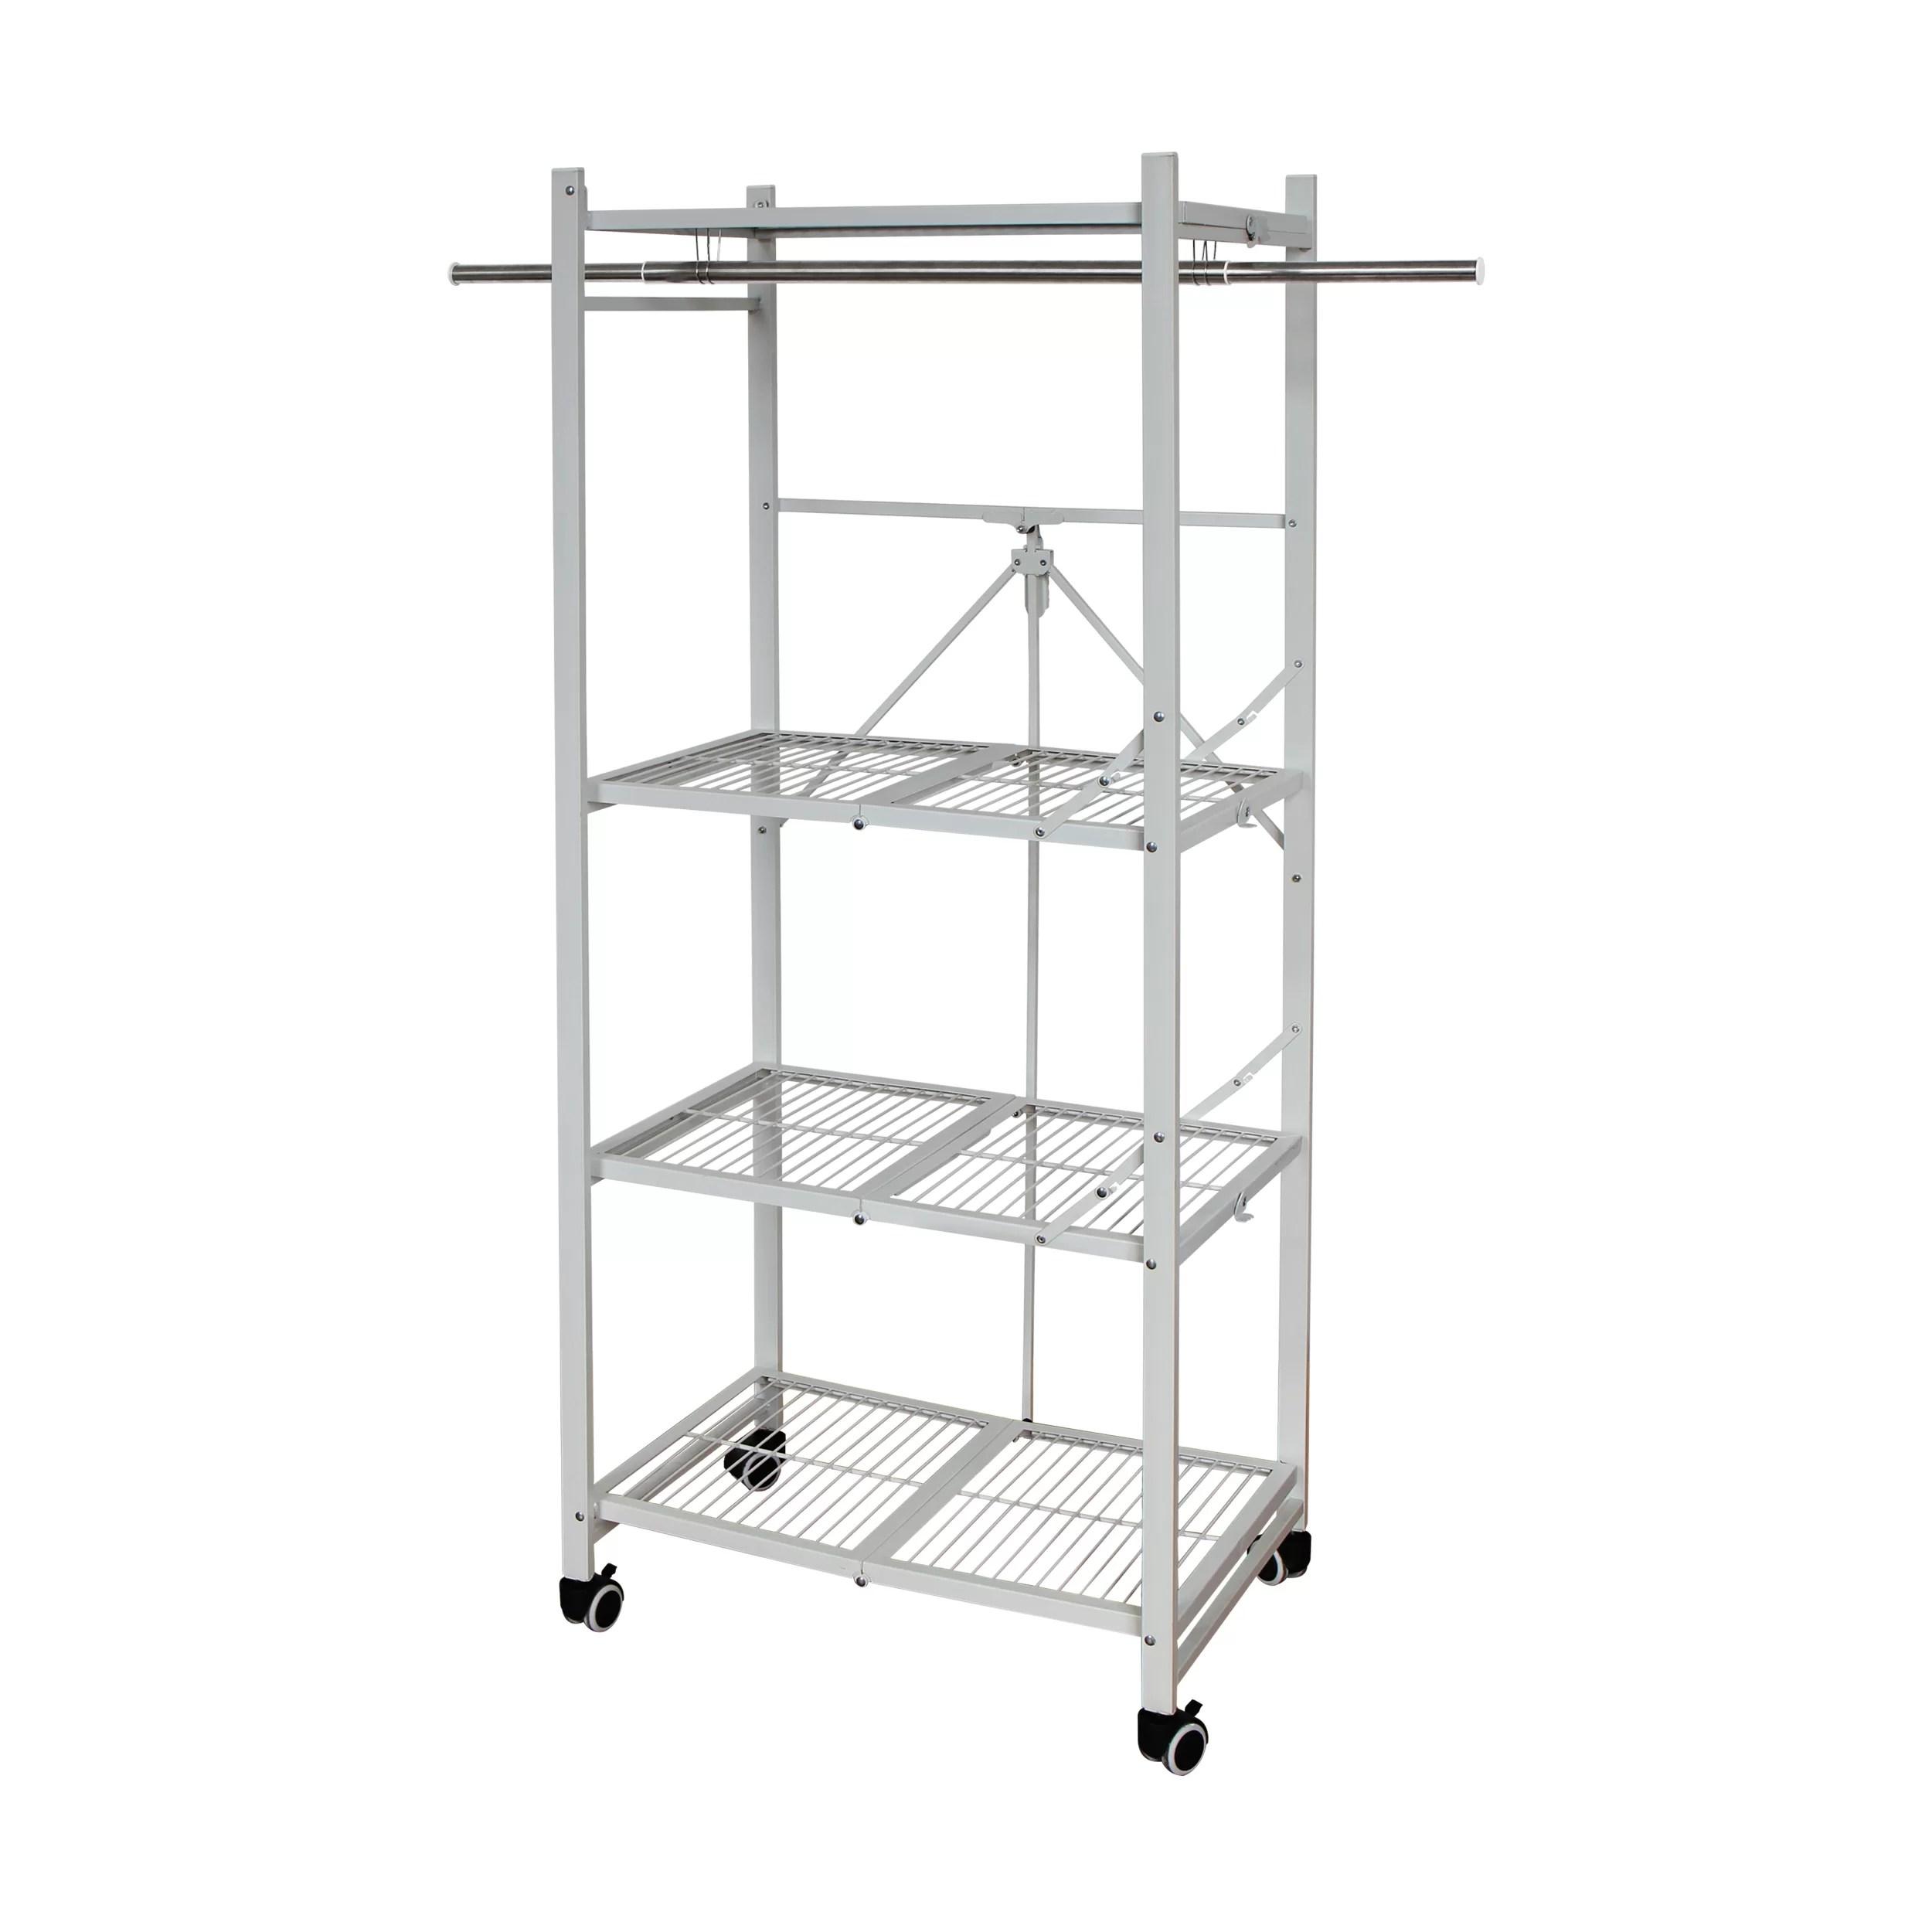 gonzalo 59 h x 25 63 w x 17 7 d foldable shelving unit storage rack